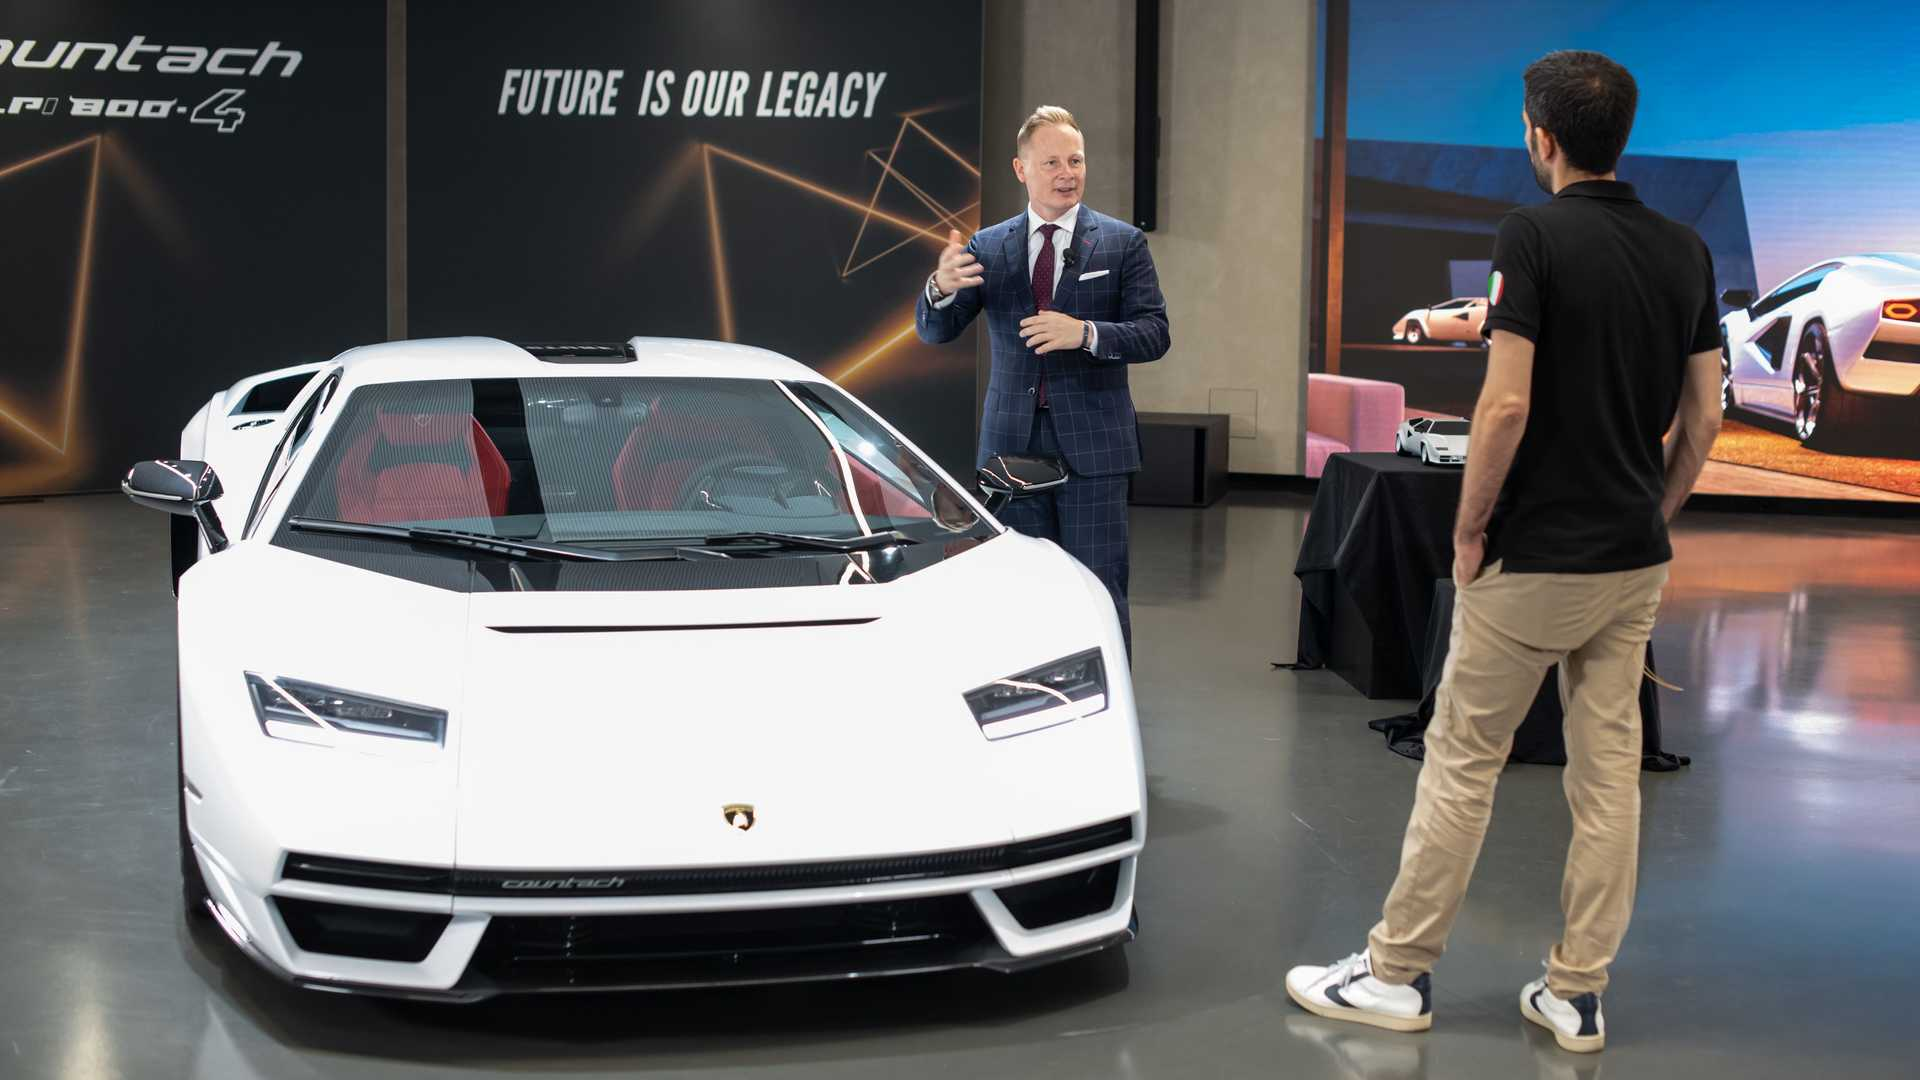 Lamborghini Countach LPI 800-4, fotos ao vivo